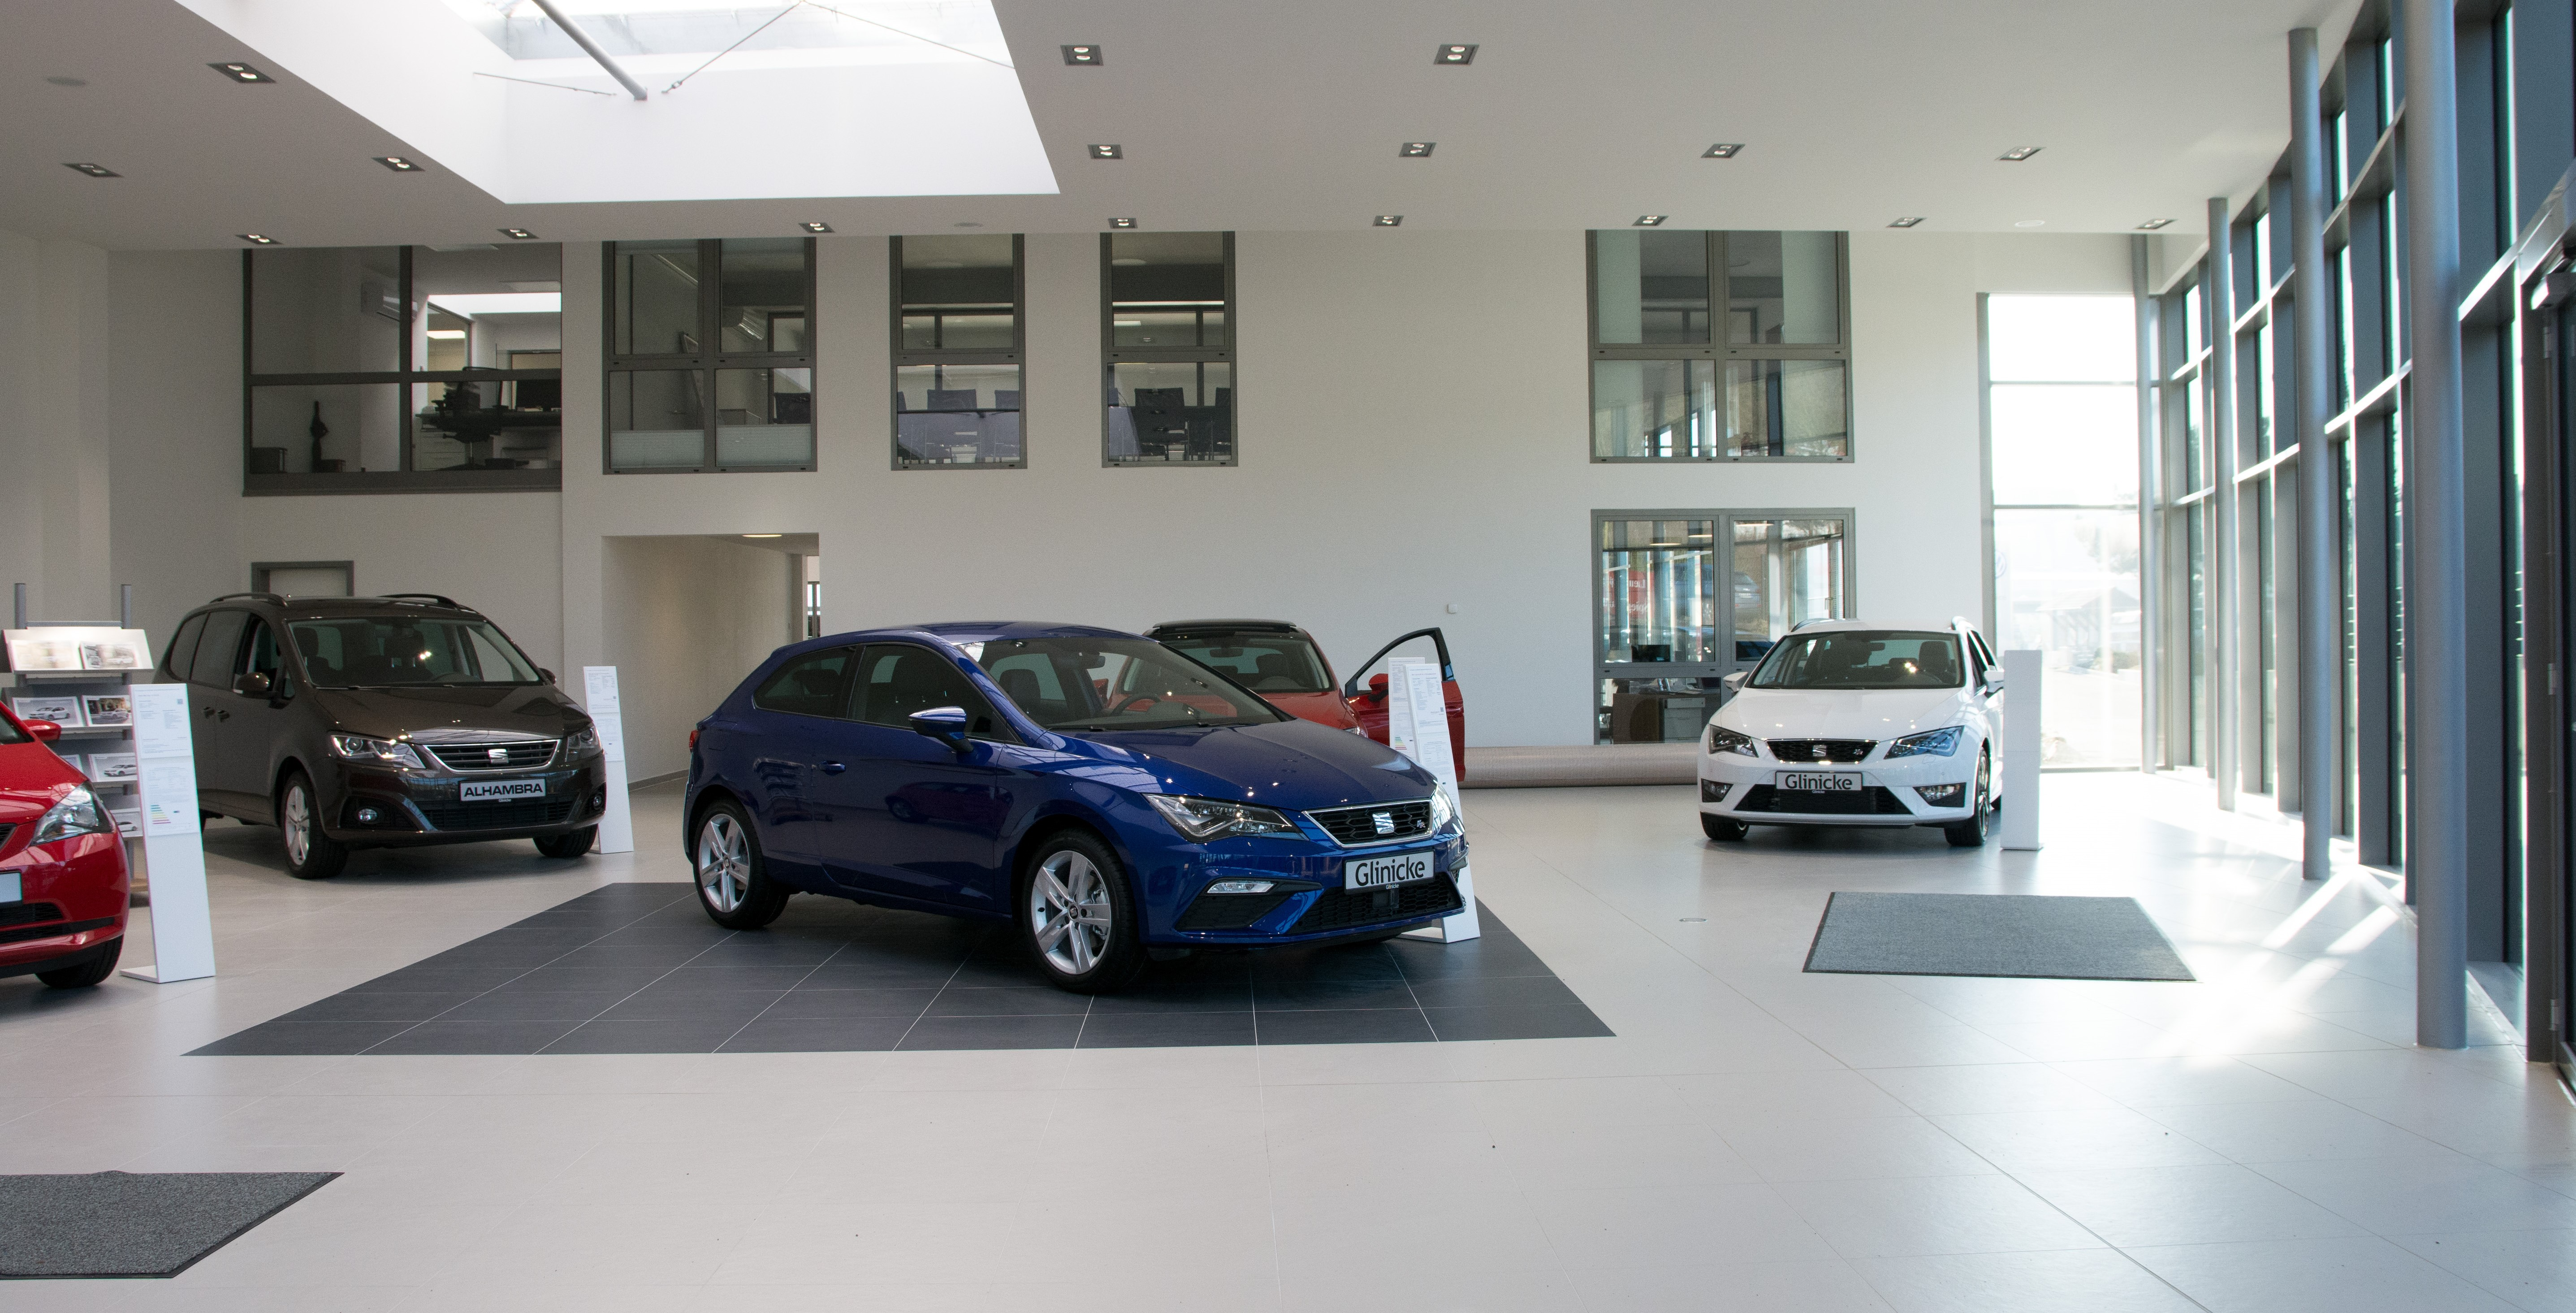 Glinicke Automobile Baunatal GmbH & Co. KG